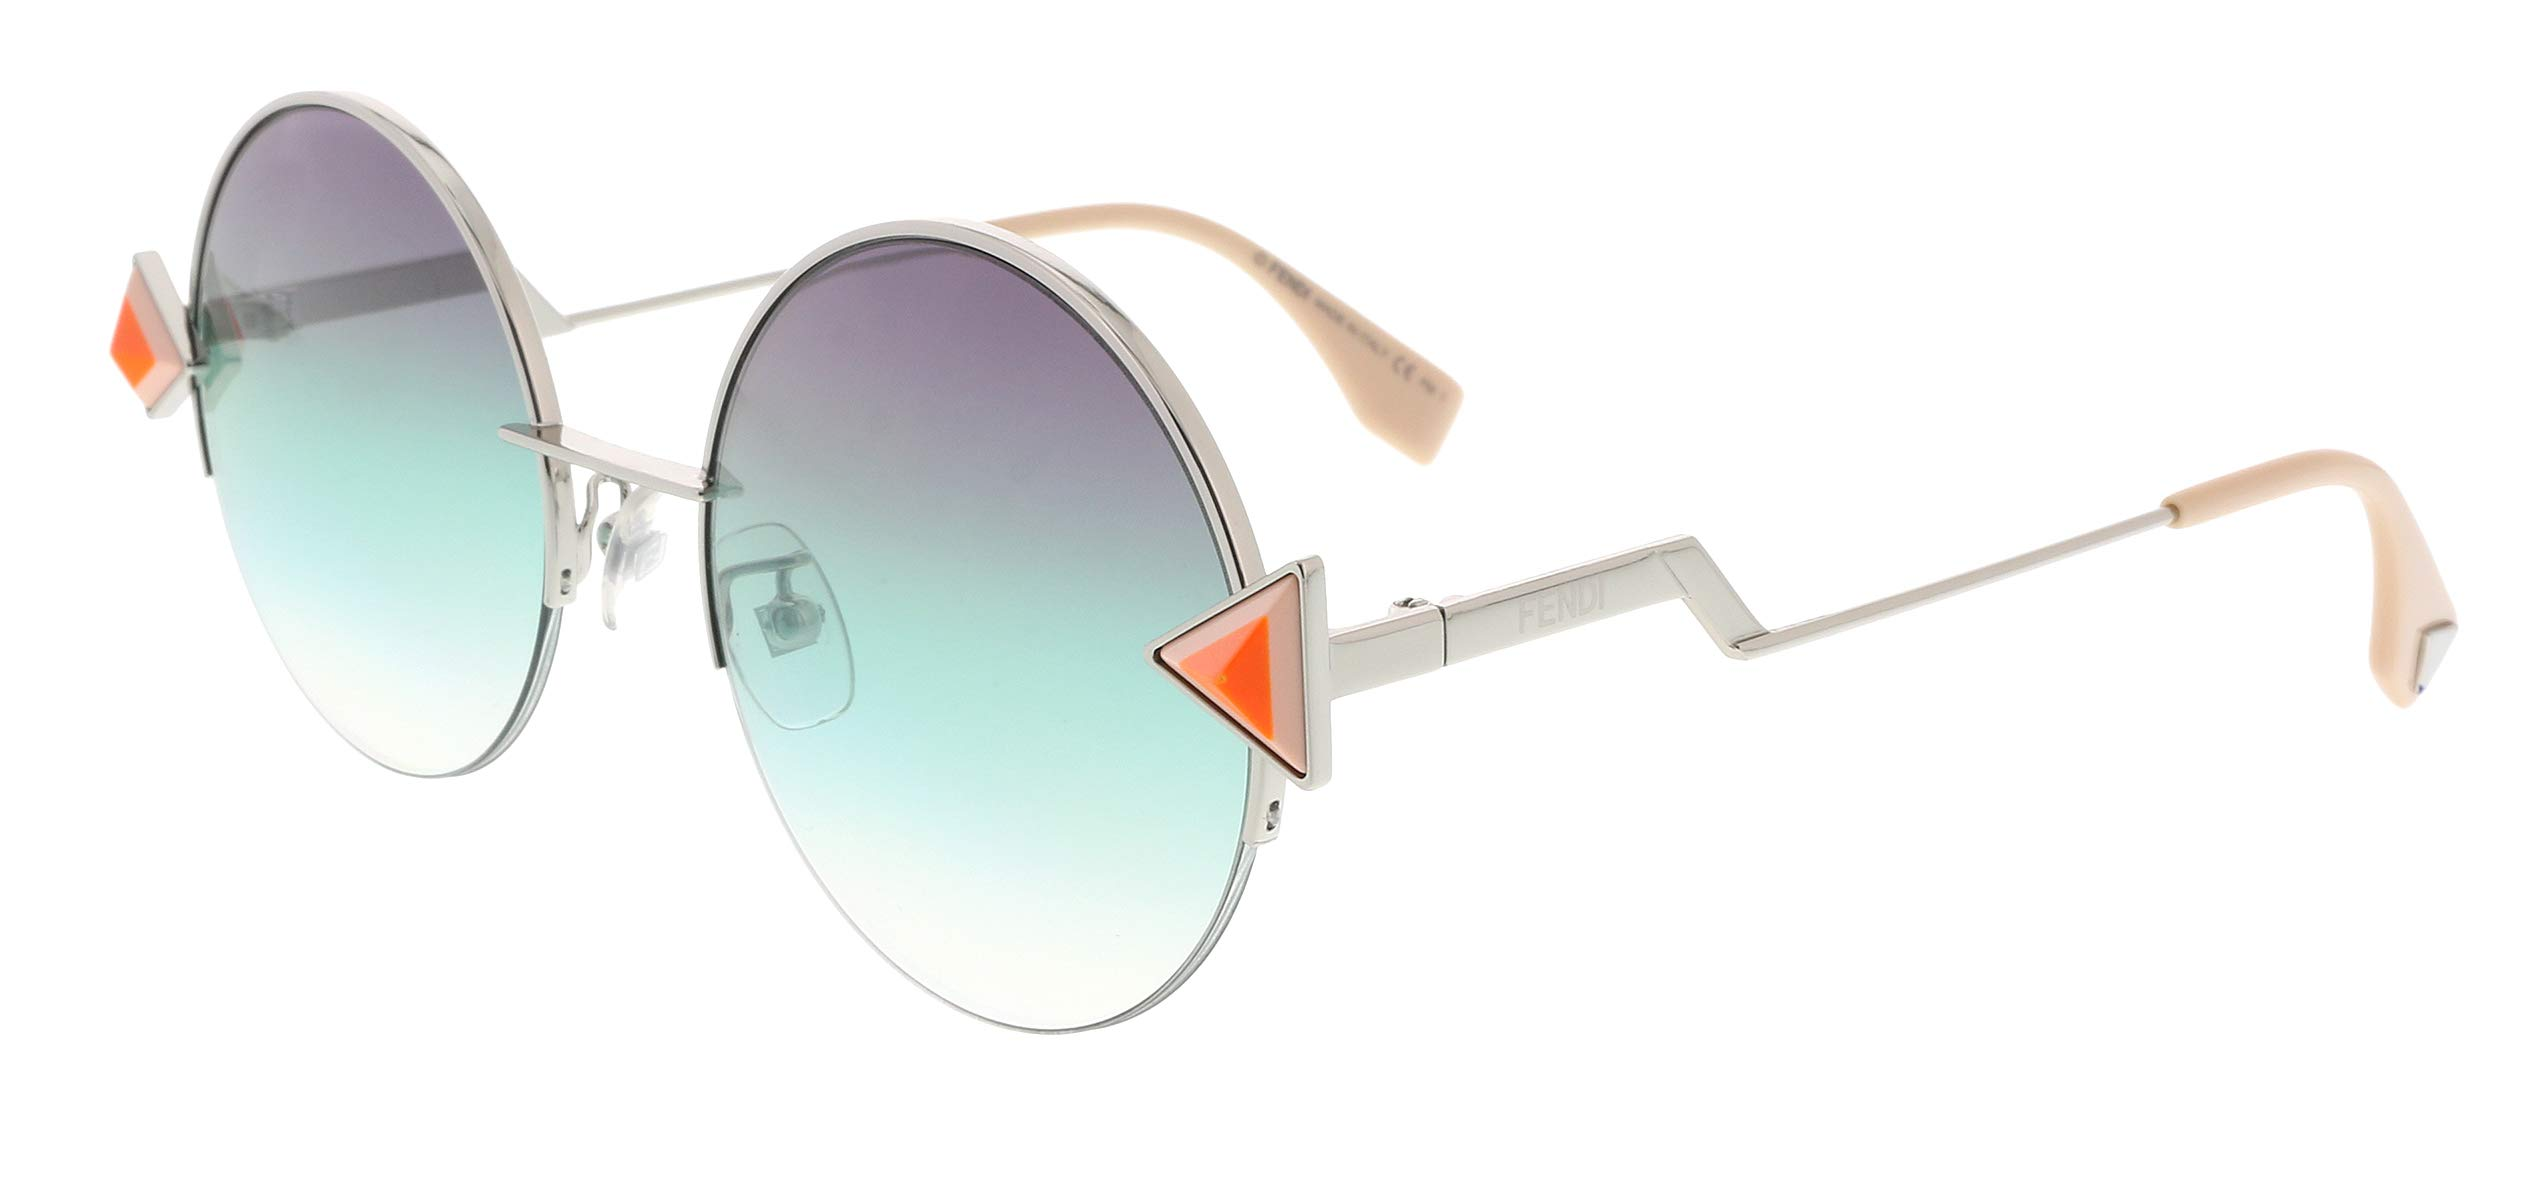 Fendi Round Sunglasses 0VGV Silver Green Frame And  Greenviolet Lens